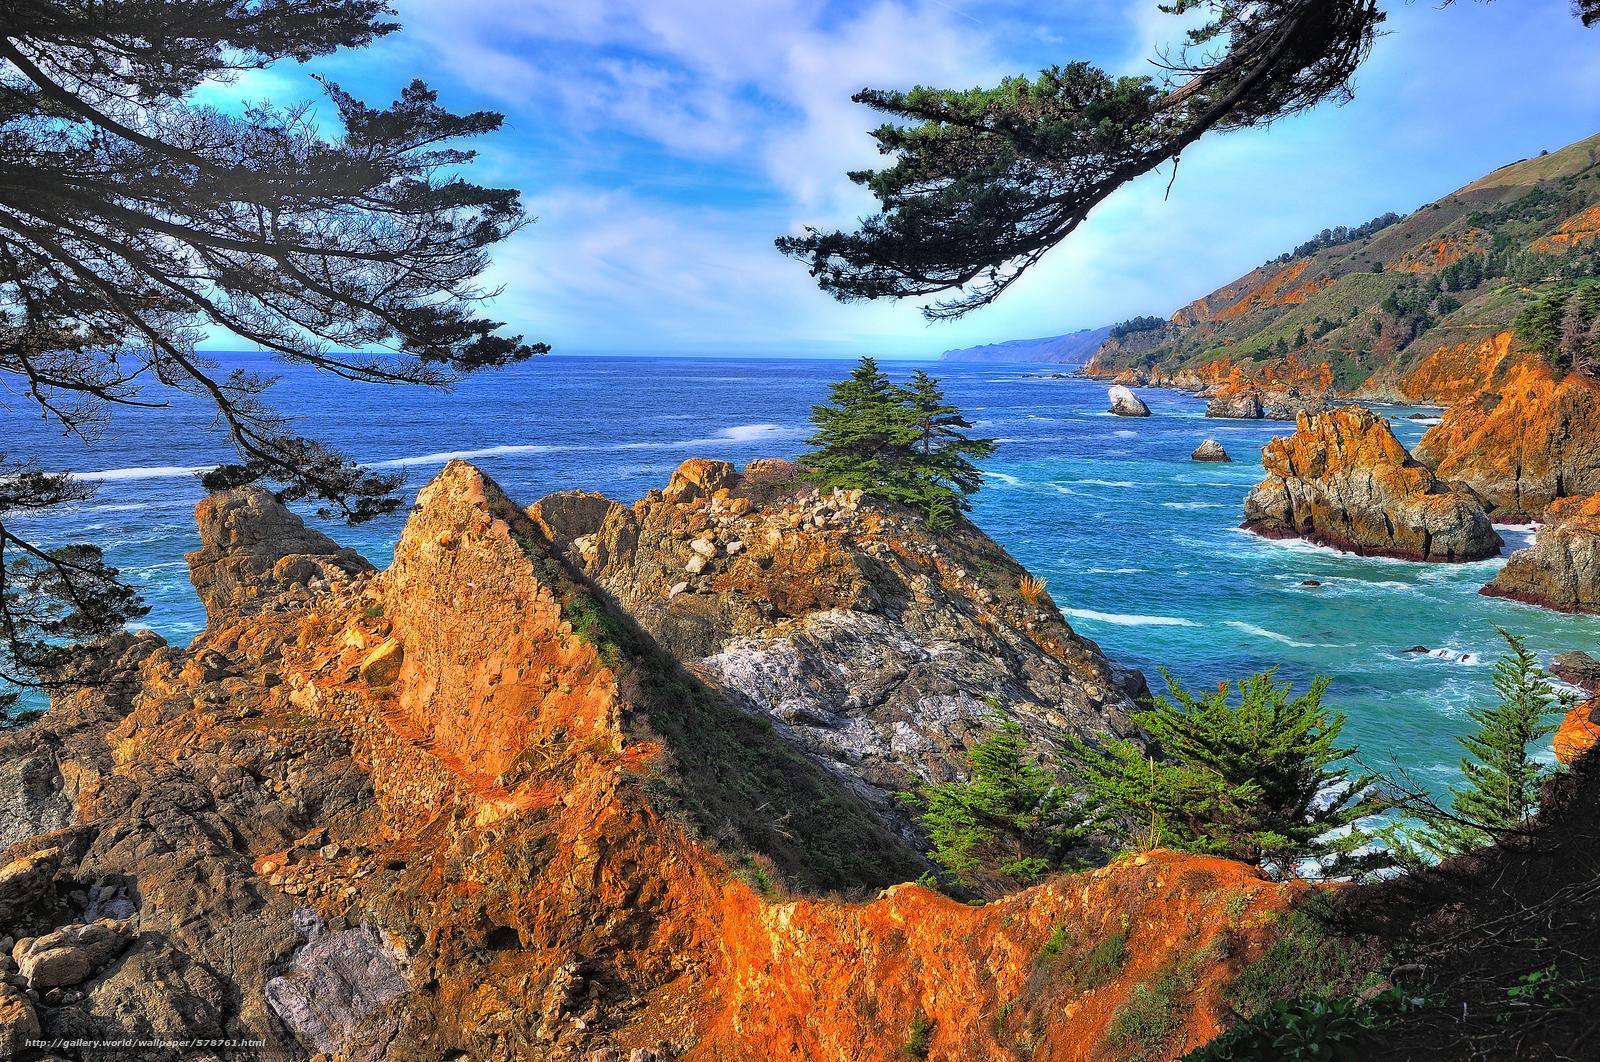 Pacific Ocean Big Sur California Beach 4k Hd Desktop: Big Sur Desktop Wallpaper